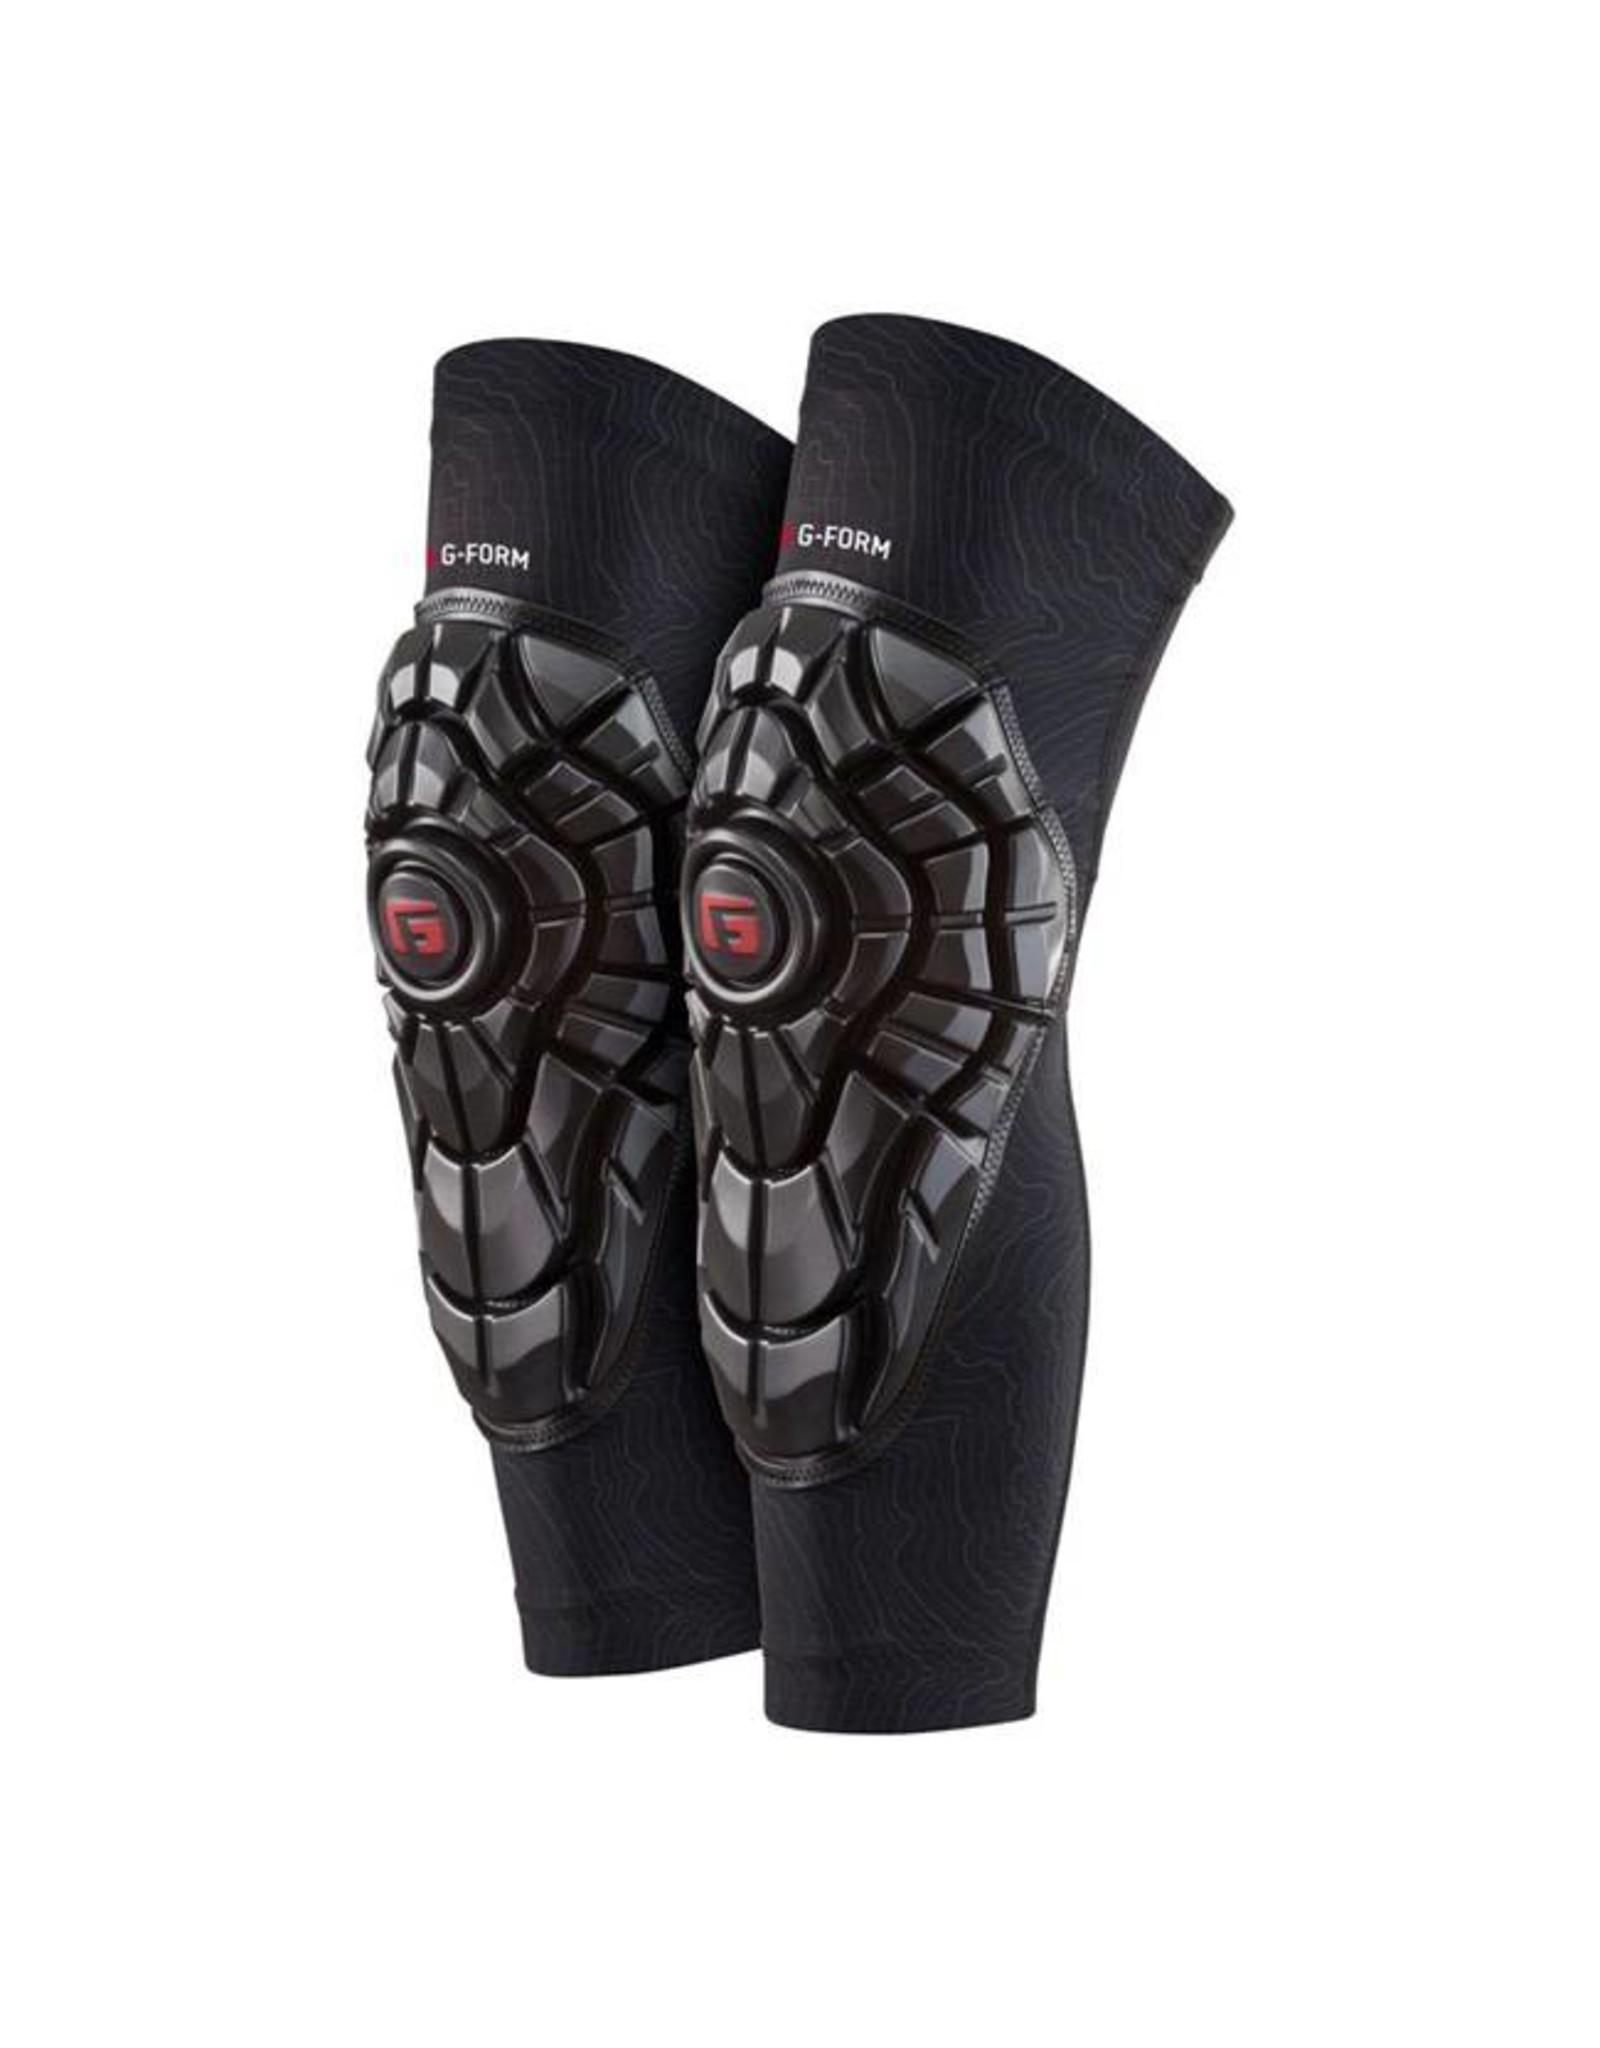 G-Form G-Form Elite Knee Pad: Black/Topo, SM